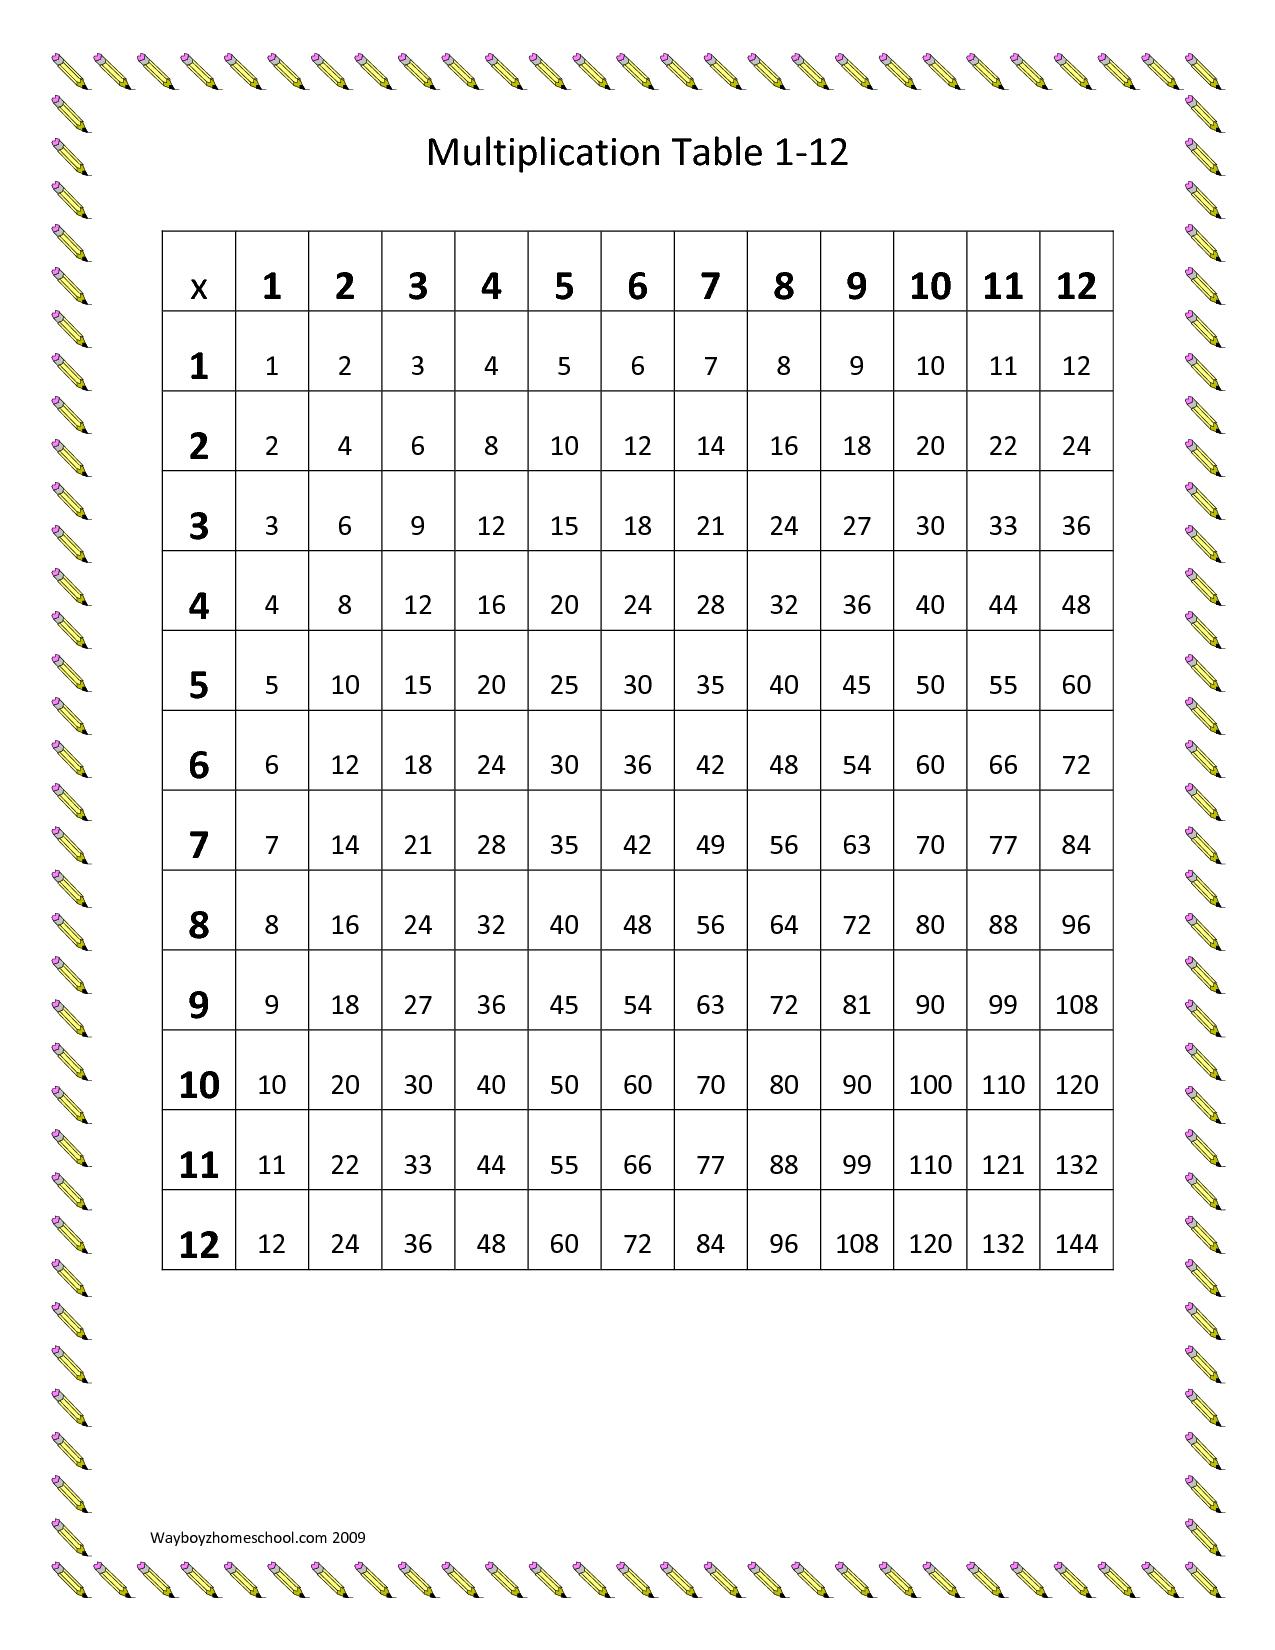 b2371fb075a19e8e394c3153cb4c2574  Th Grade Math Worksheets Fractions on 4th grade common core mathematics, fractions worksheets fractions, equivalent fractions, 5th grade math fractions, 4th grade work sheets, 4th graders, multiplication worksheets fractions, 4th grade addition worksheets, super teacher worksheets fractions, 4th grade division worksheets, teaching fractions, 4th grade science worksheets, scale factor with fractions, adding fractions, first grade math fractions, 4th grade multiplication worksheets,